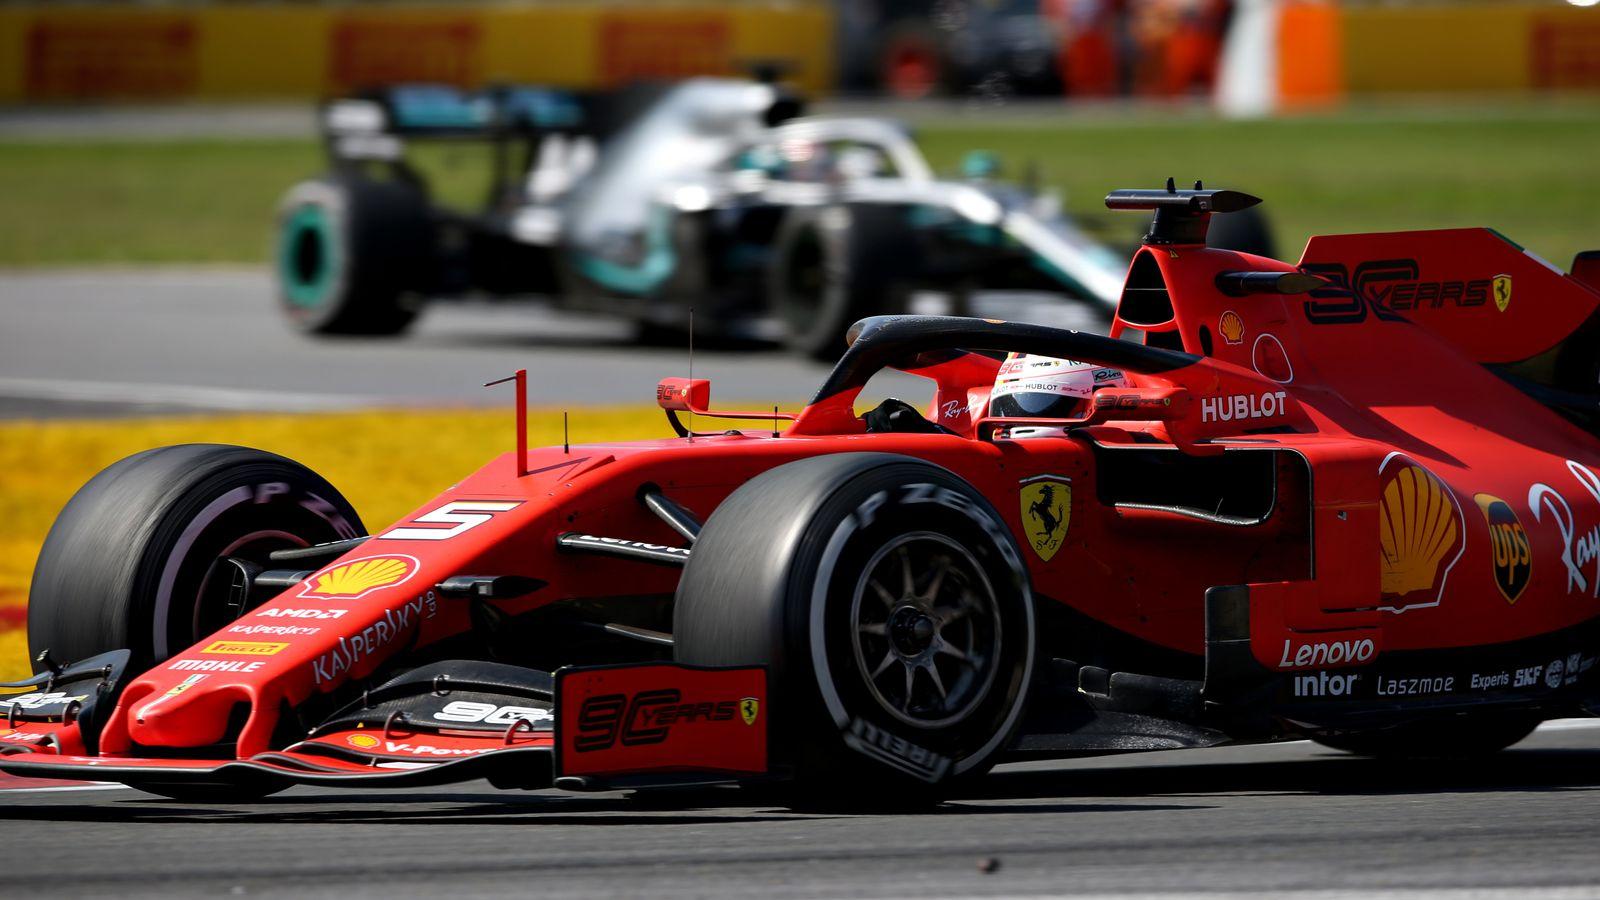 GP de Canadá novena carrera de F1 2020 se cancelará debido a coronavirus 45